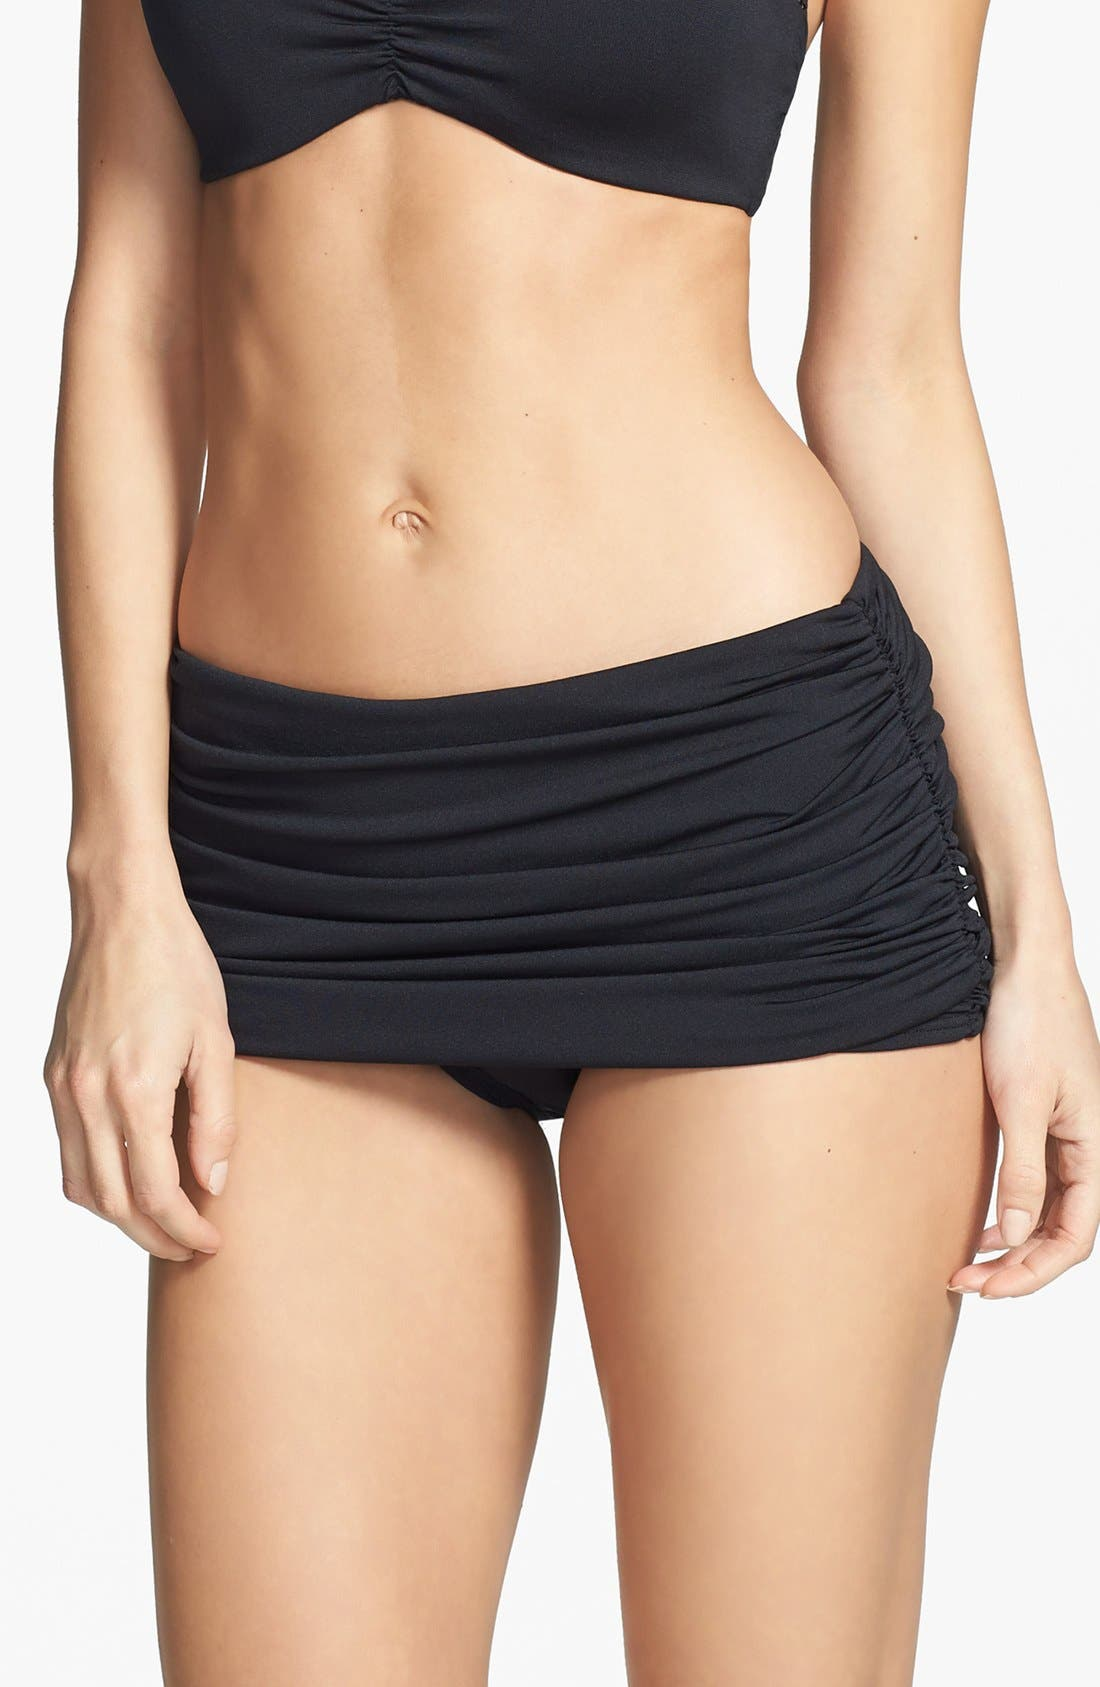 Alternate Image 1 Selected - Carmen Marc Valvo 'Cape Town Beach' Shirred Skirted Bikini Bottoms